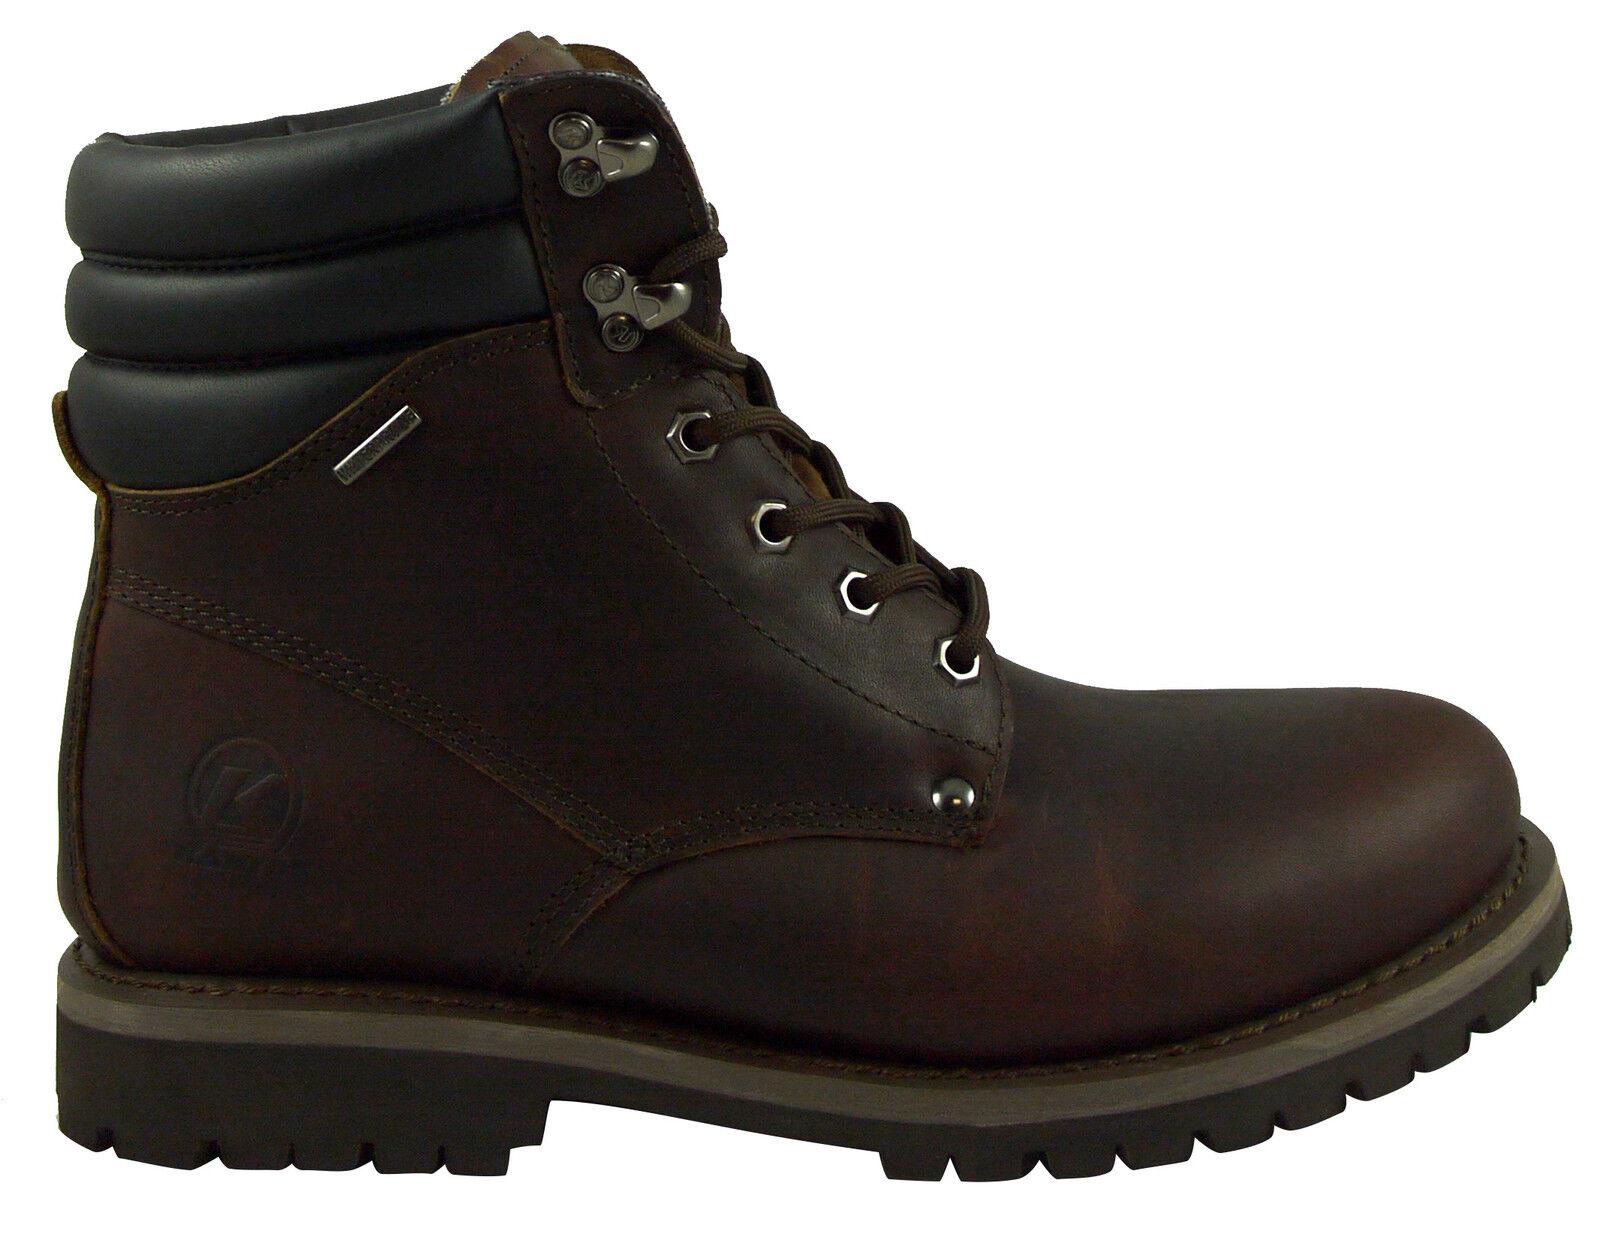 botas al tobillo para Hombre Kanyon Briar caminando patio Bota De Cuero Impermeable Suela De Goma